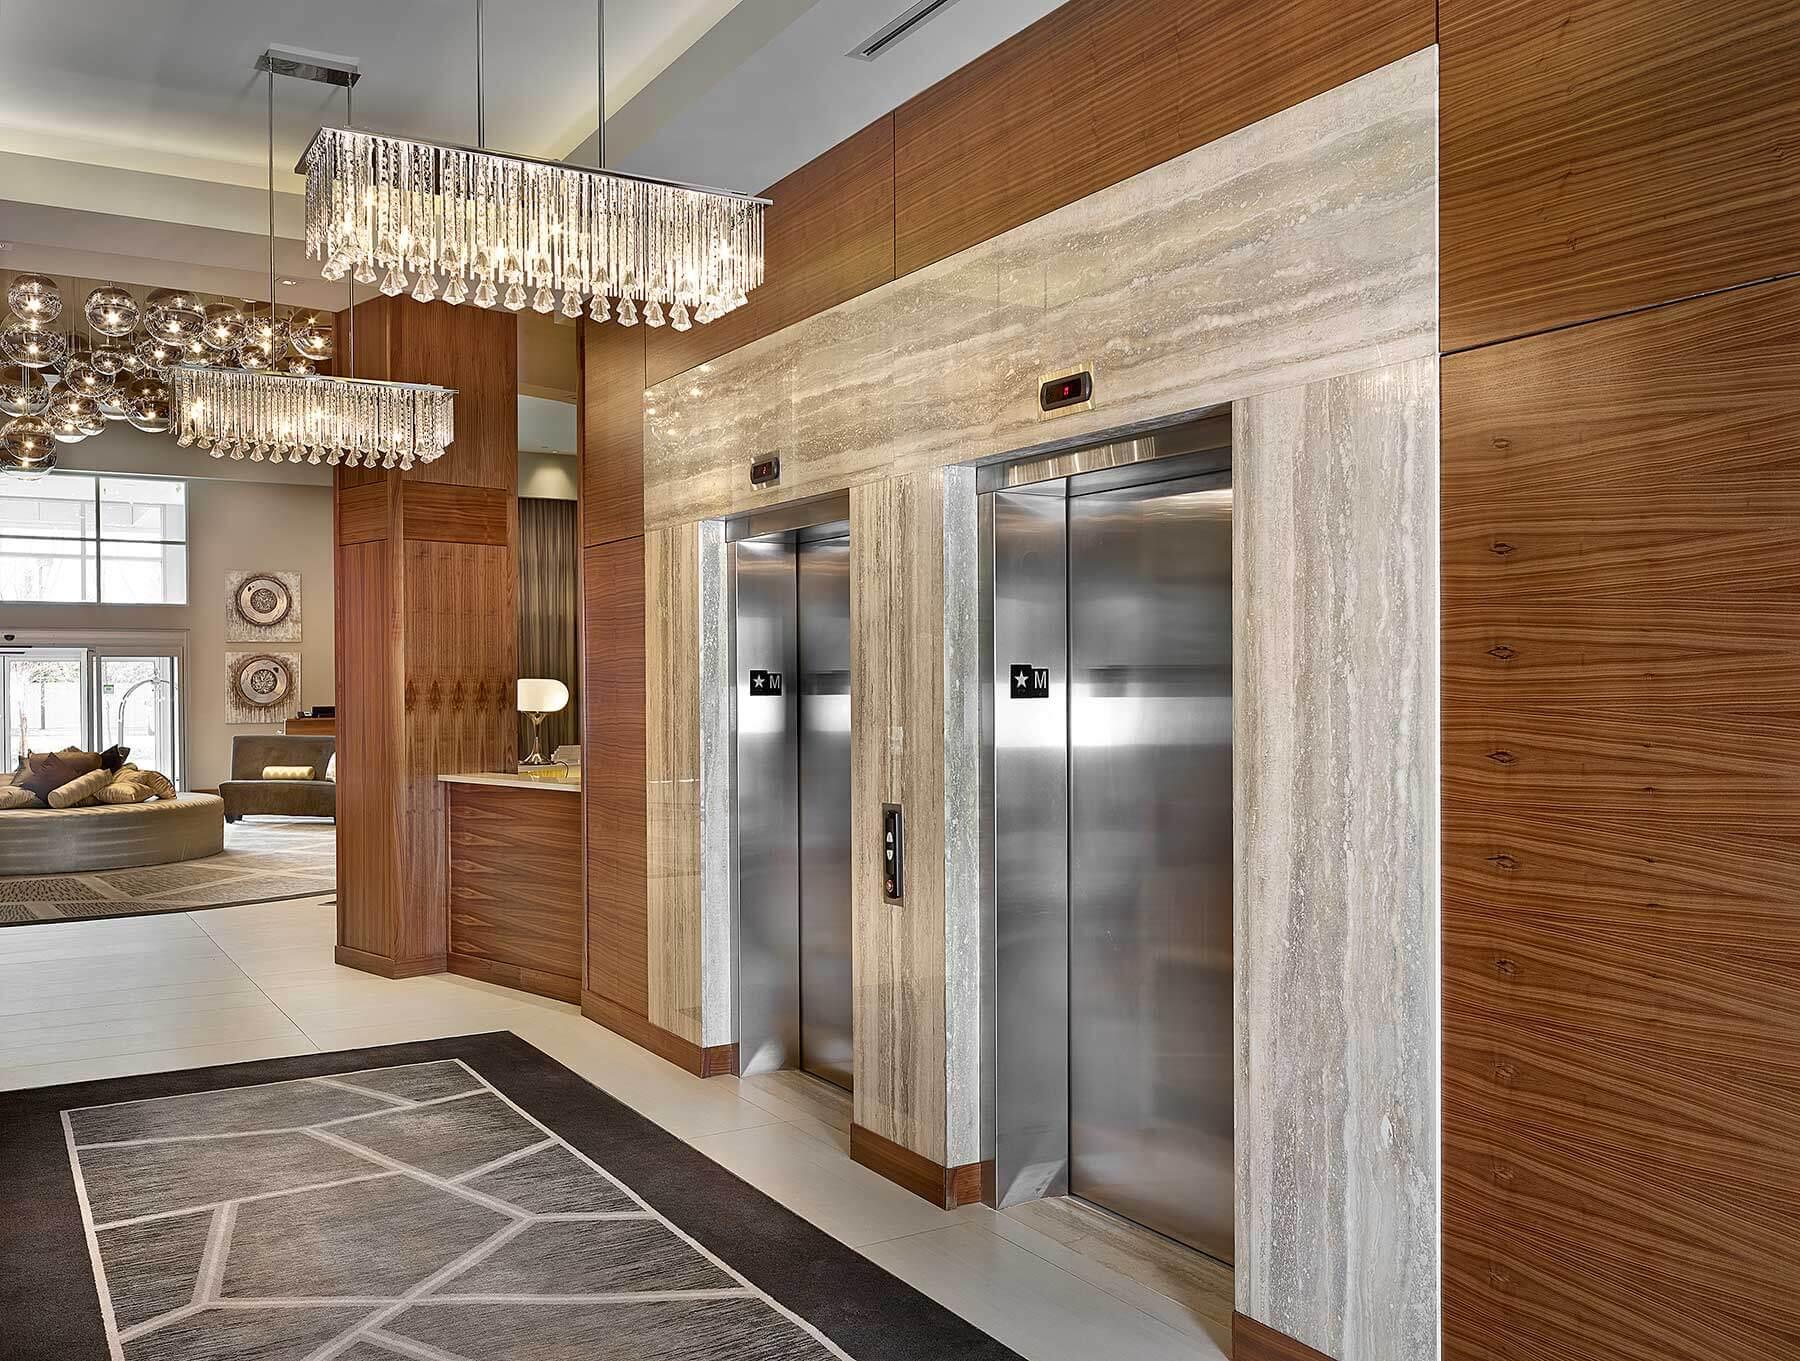 Radisson Hotel Conference Center project 7, hotel interior design Edmonton